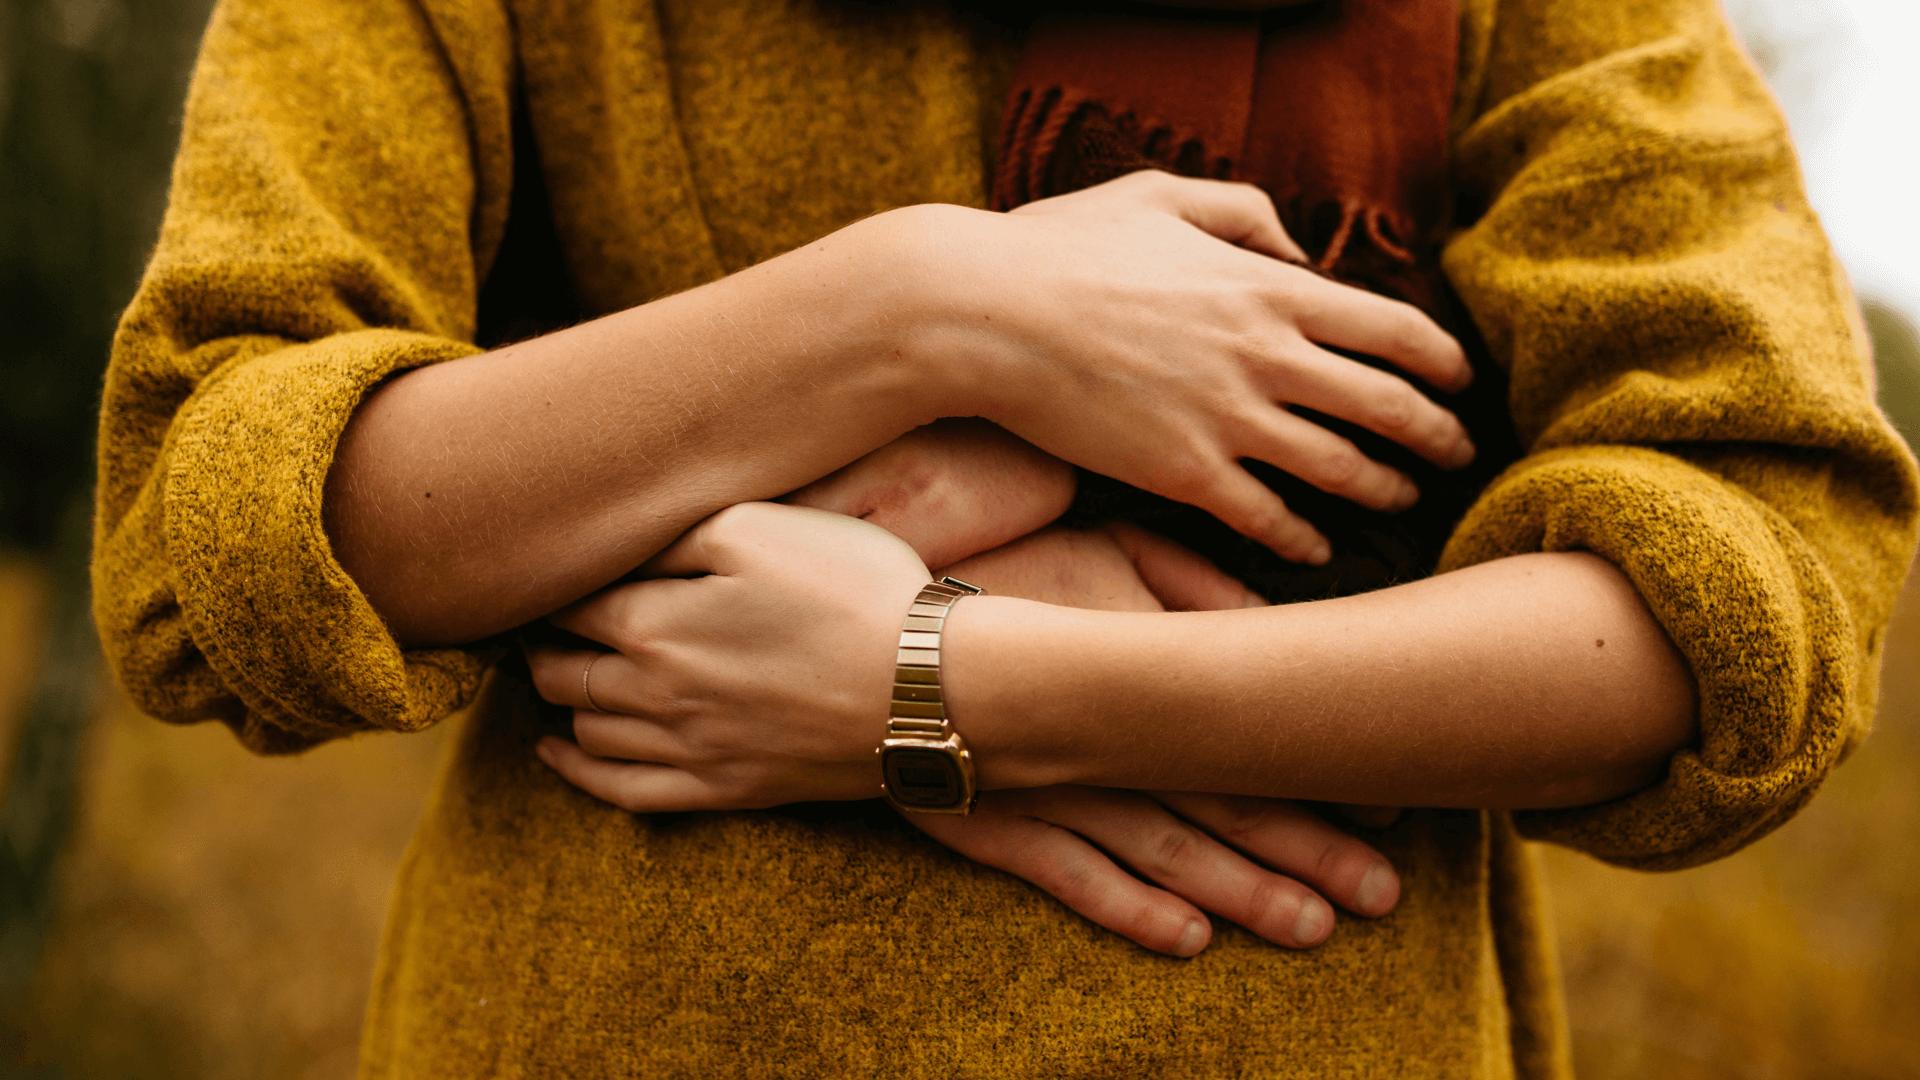 Polycystic ovarian syndrome infertility treatment